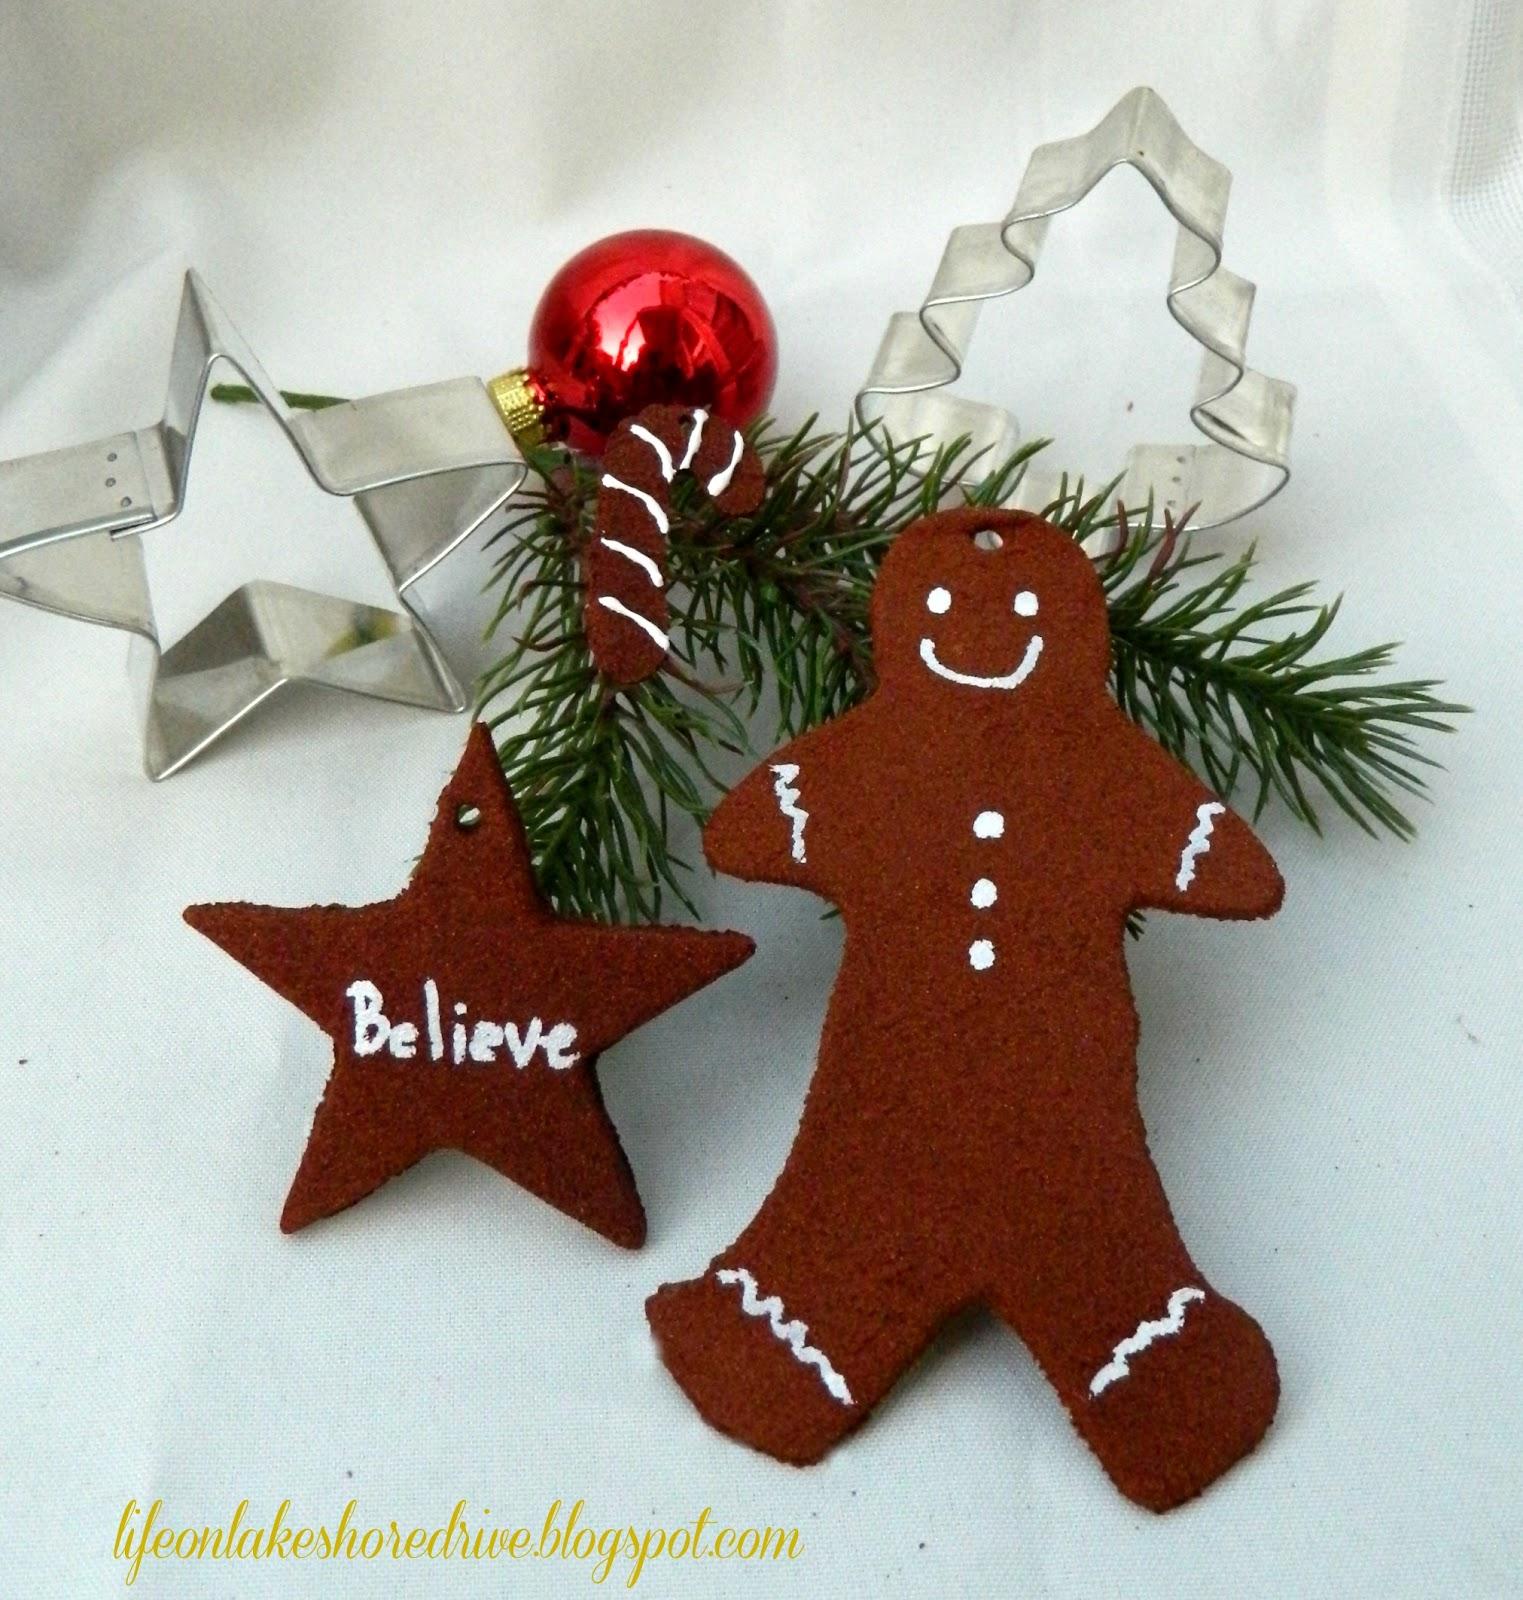 Cinnamon Applesauce Ornament Tutorial & Fun Ways to Use ...